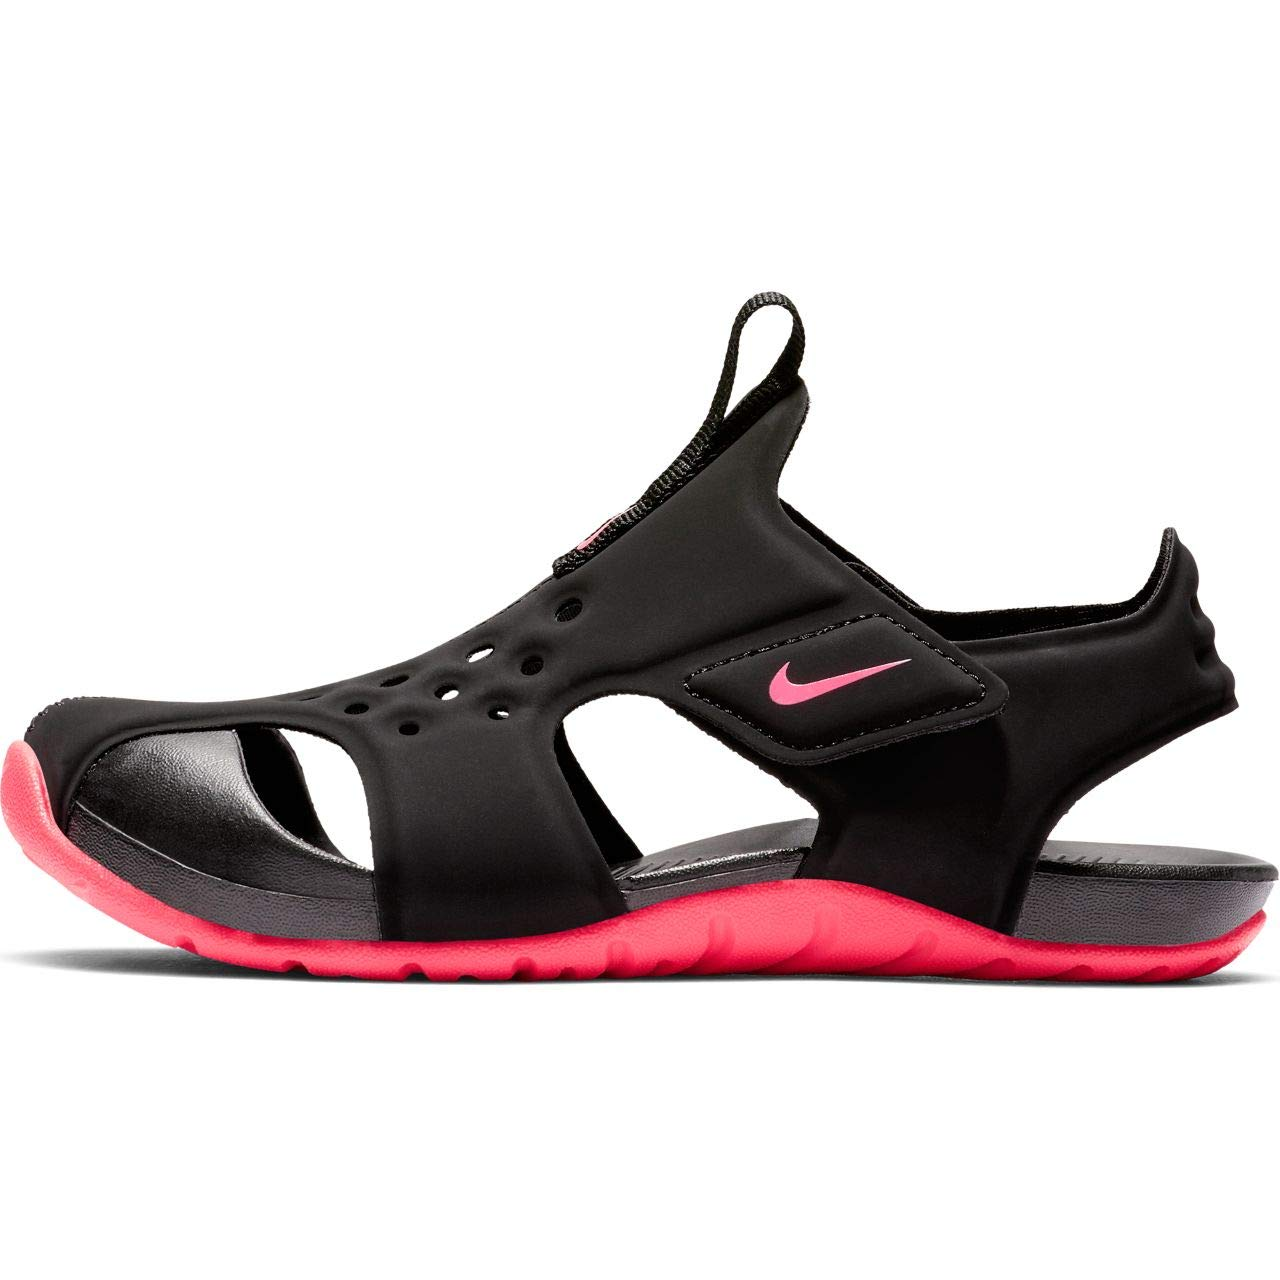 Nike Boy's Sunray Protect 2 (PS) Pre School Sandal Black/Racer Pink Size 13 Kids US